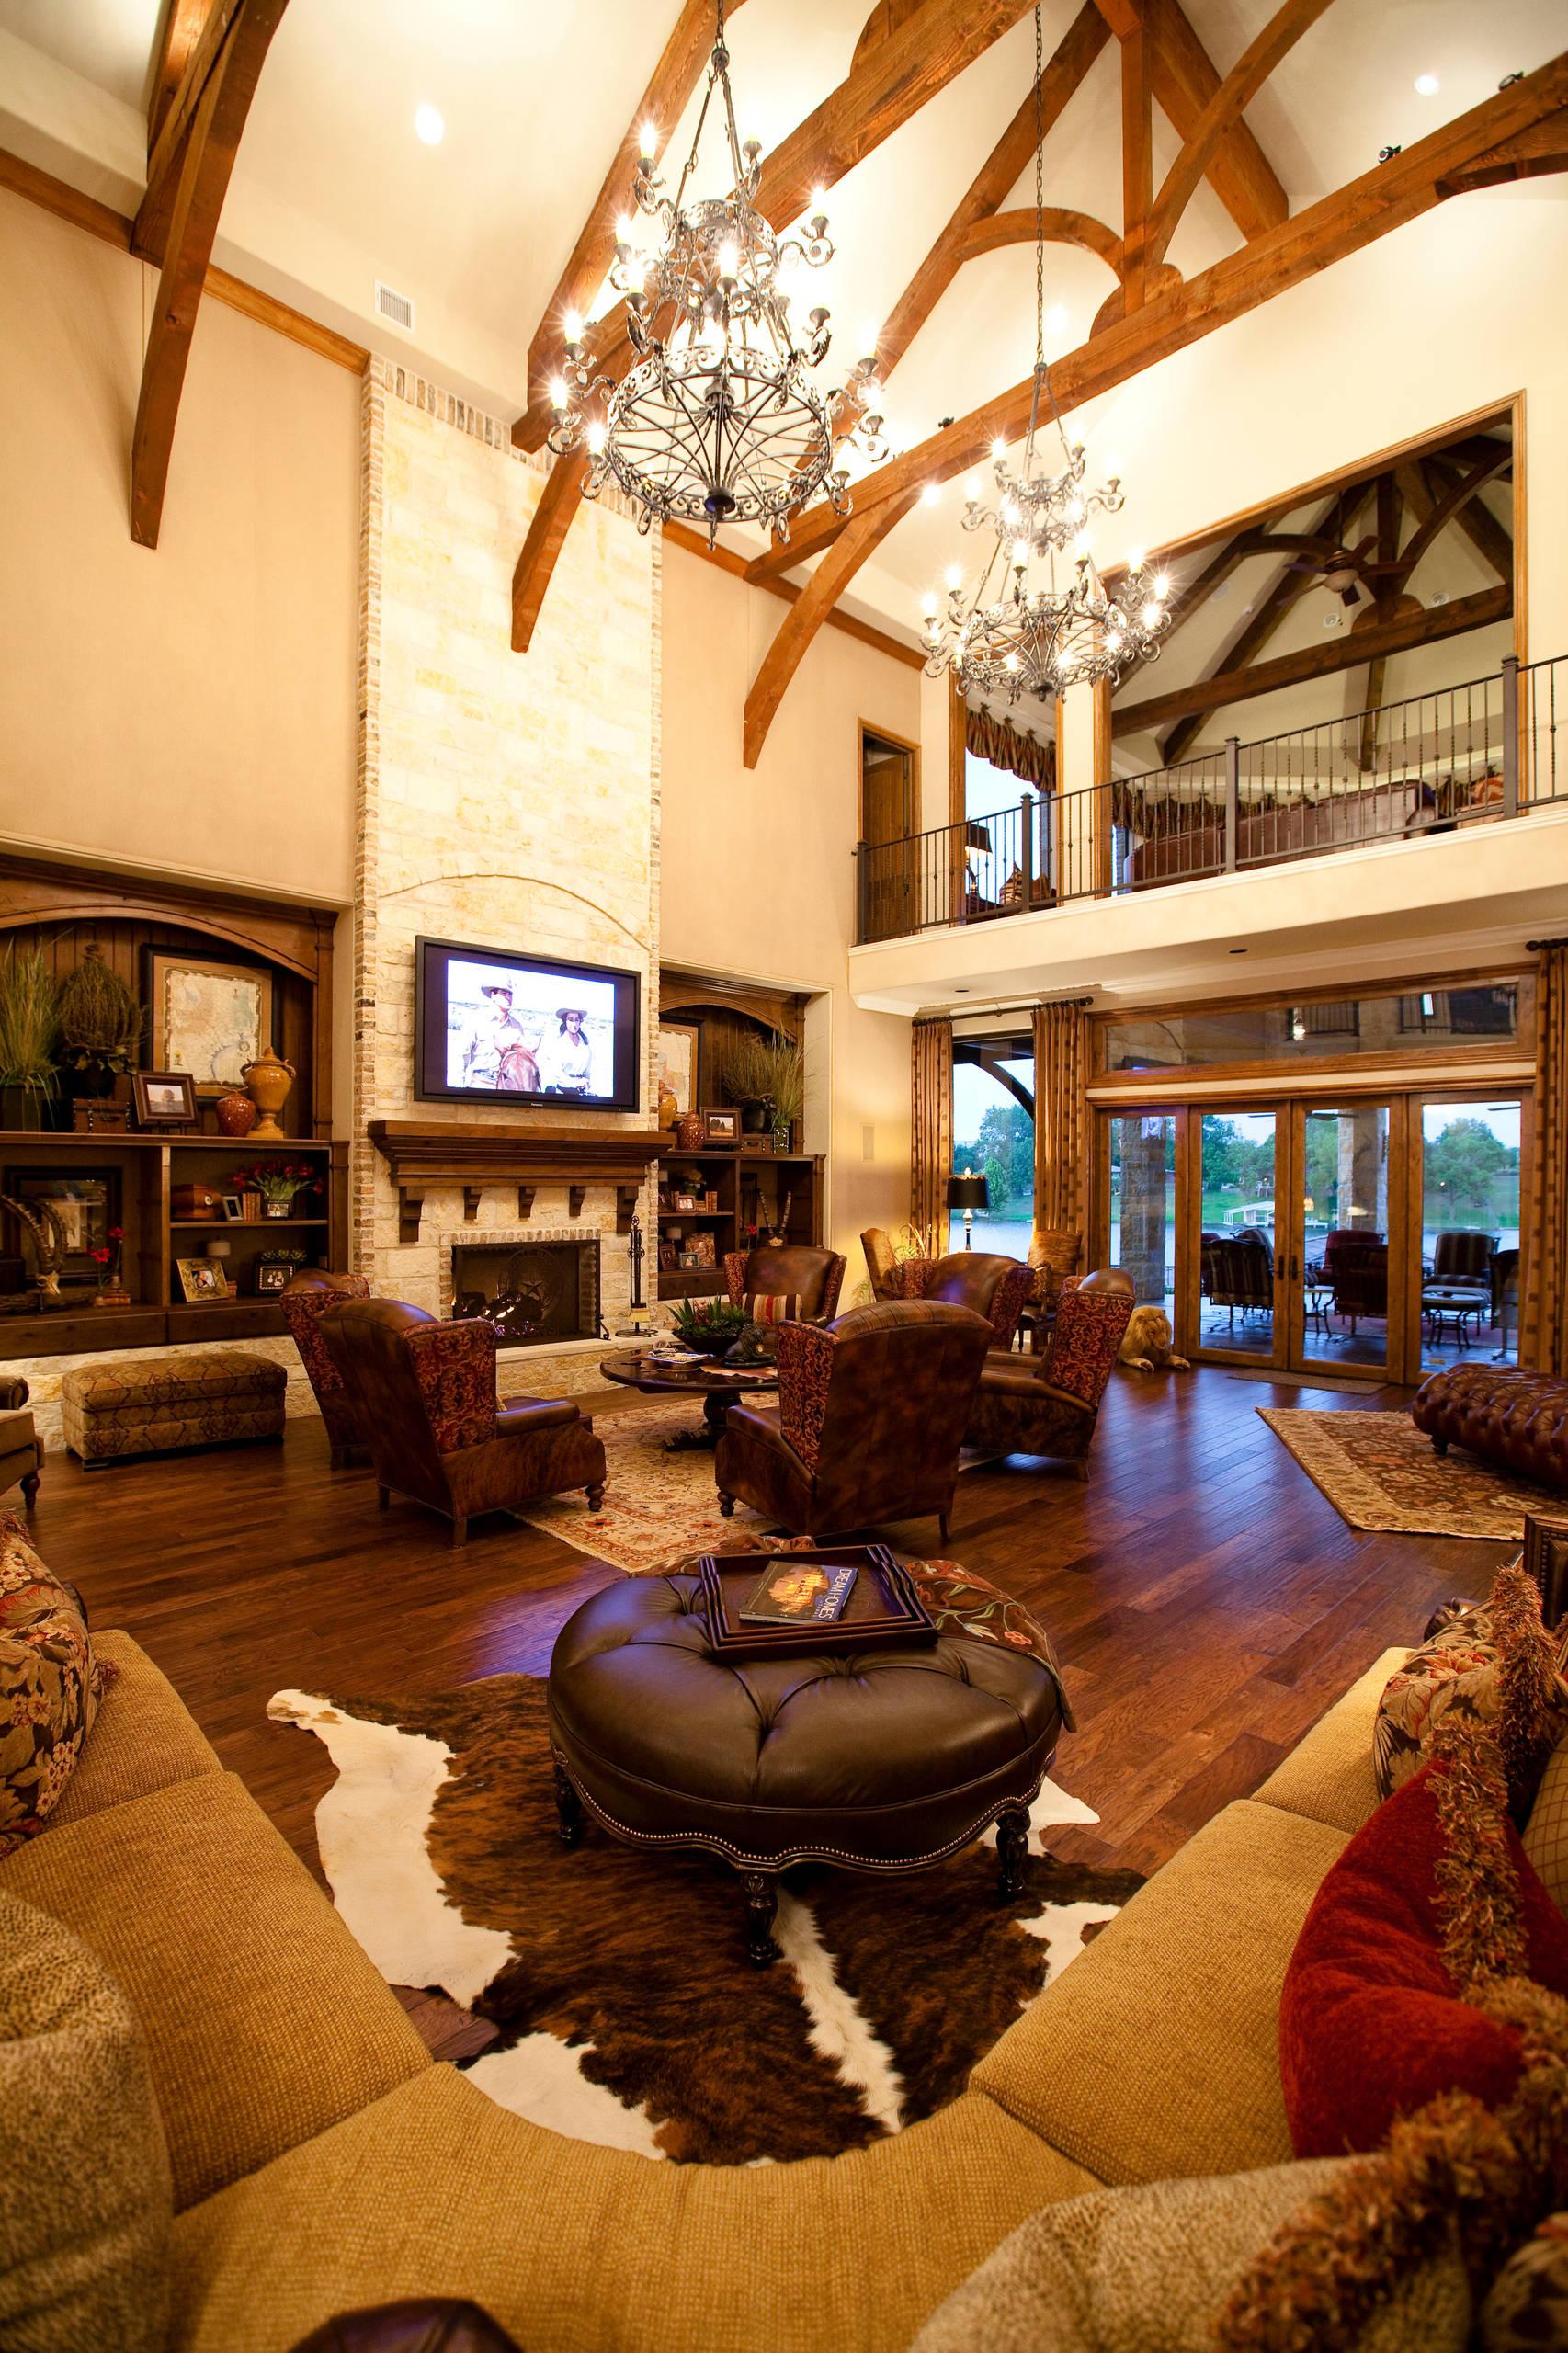 Western Living Room Houzz, Western Living Room Design Ideas